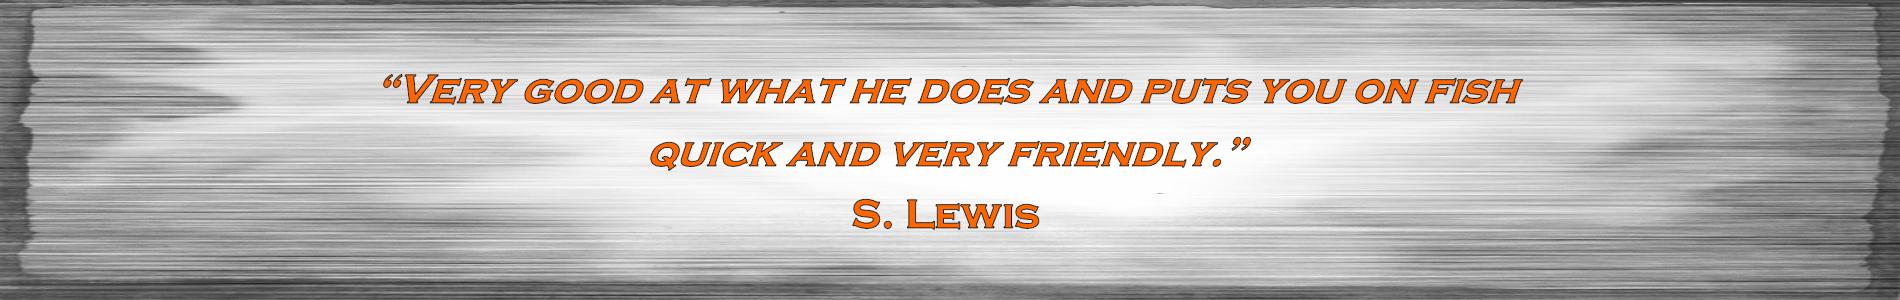 Lewis_Testimonial